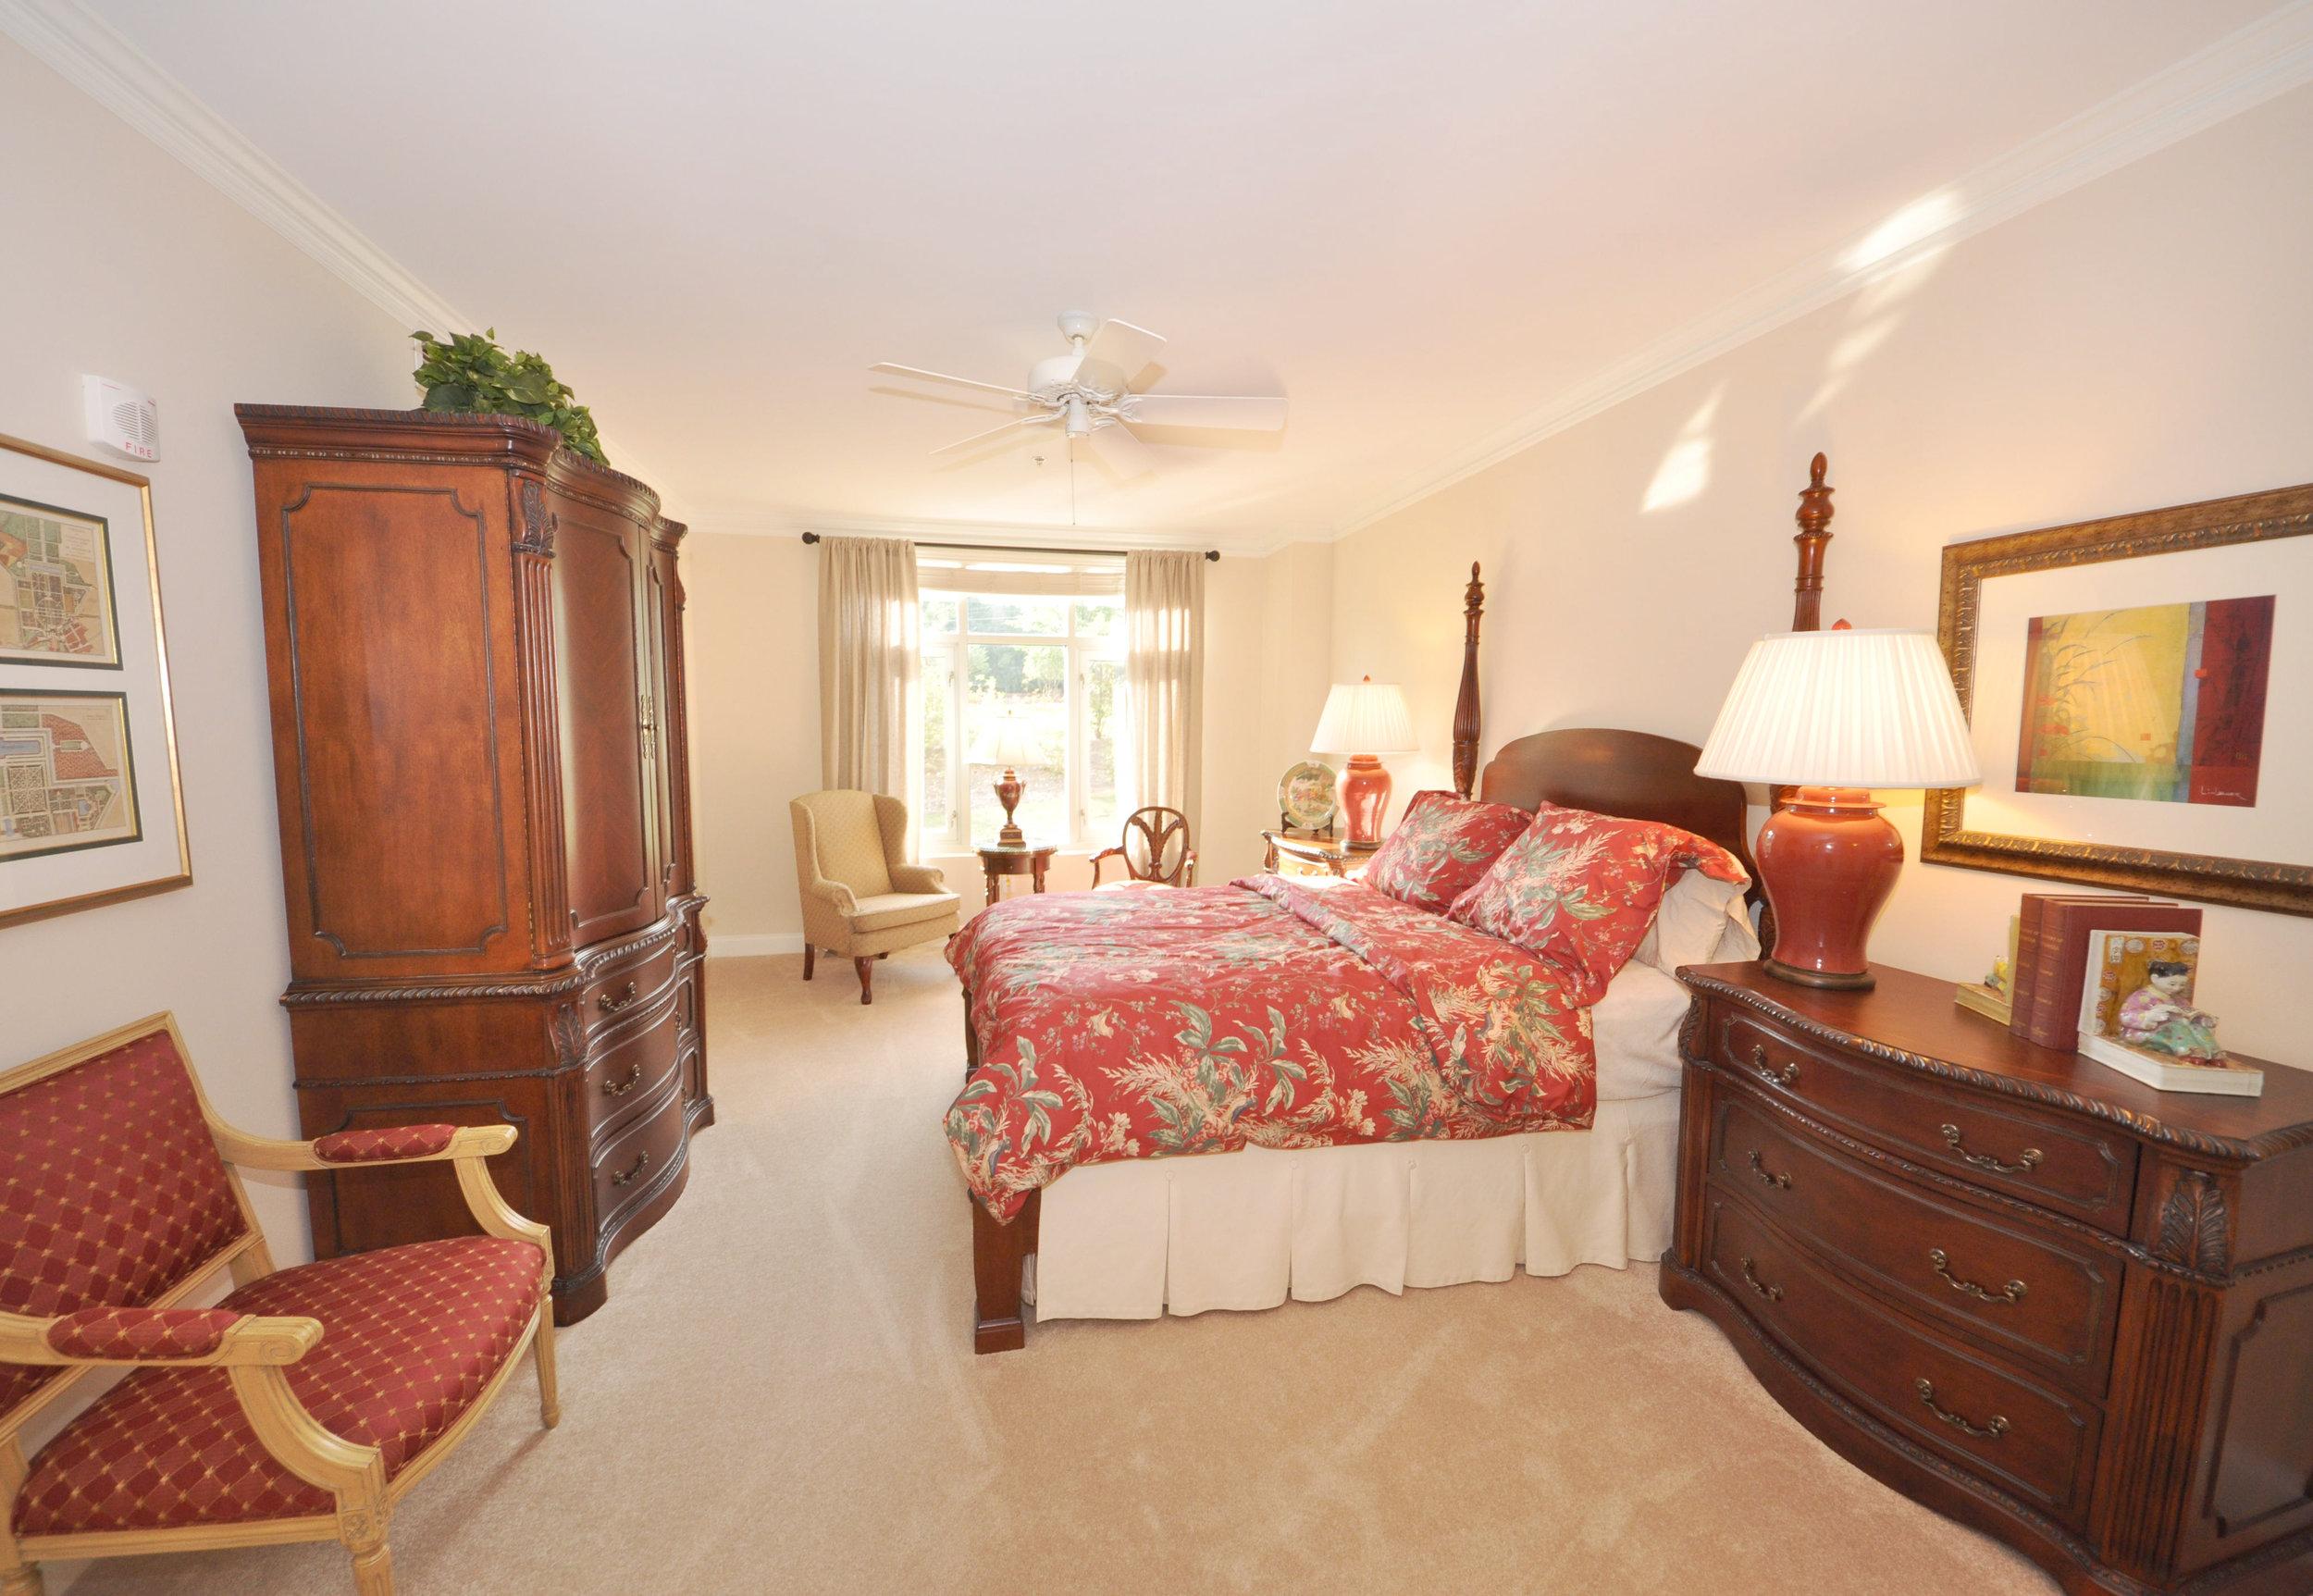 CC-Model-bedroom copy (1).jpg